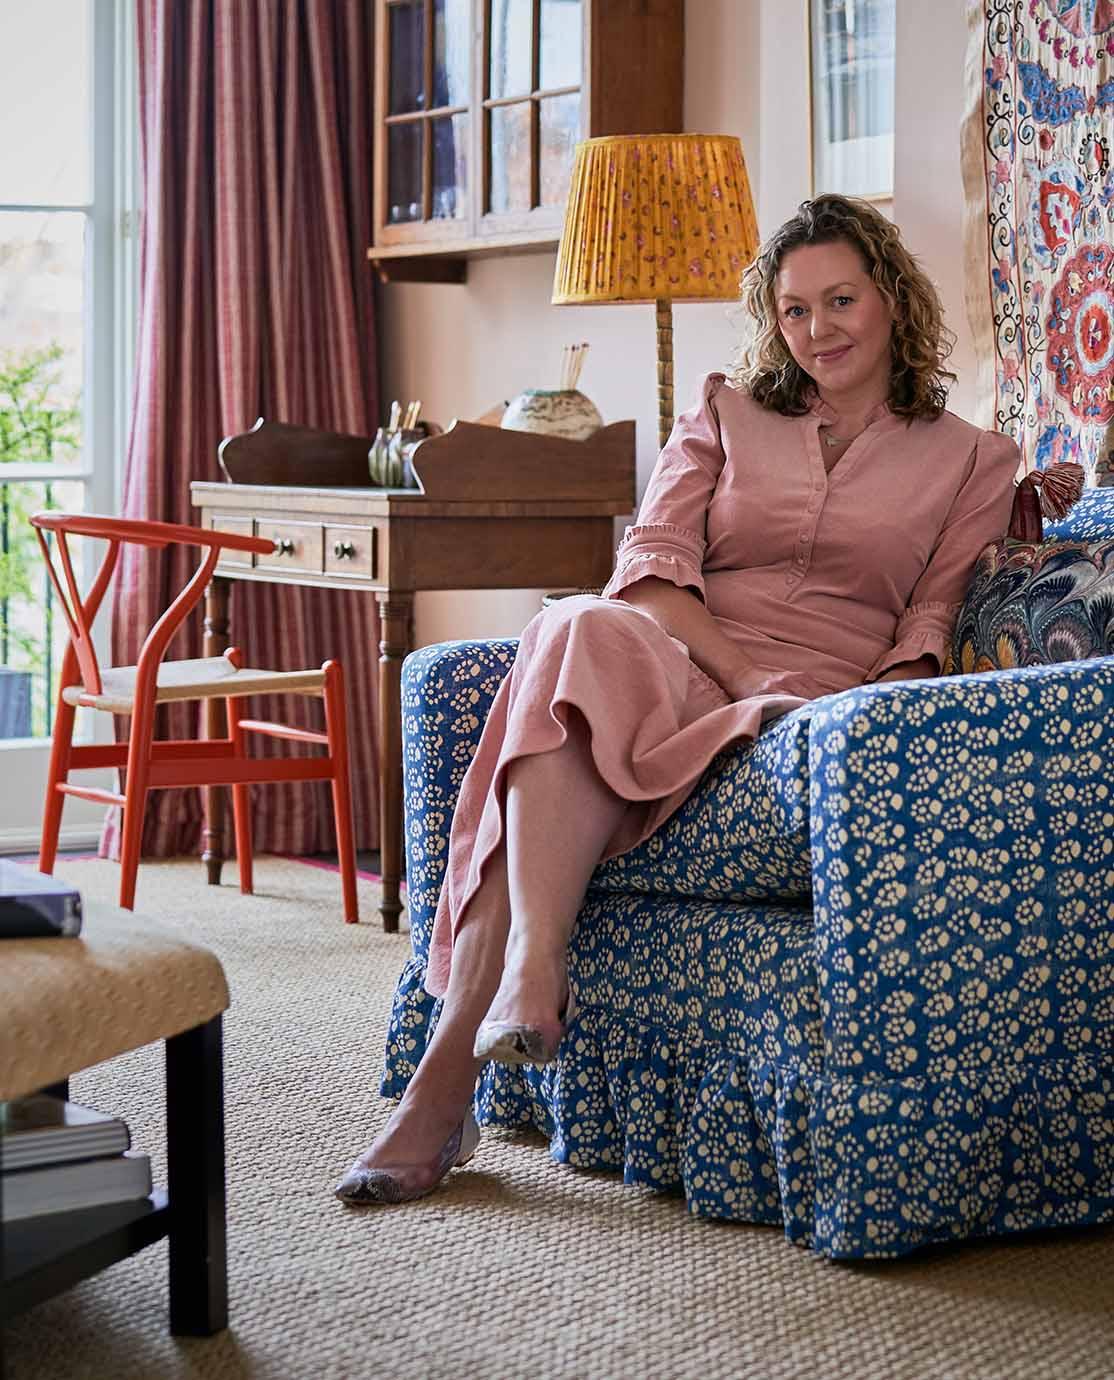 Jessica Buckley sat on her bespoke Tailored by OKA sofa